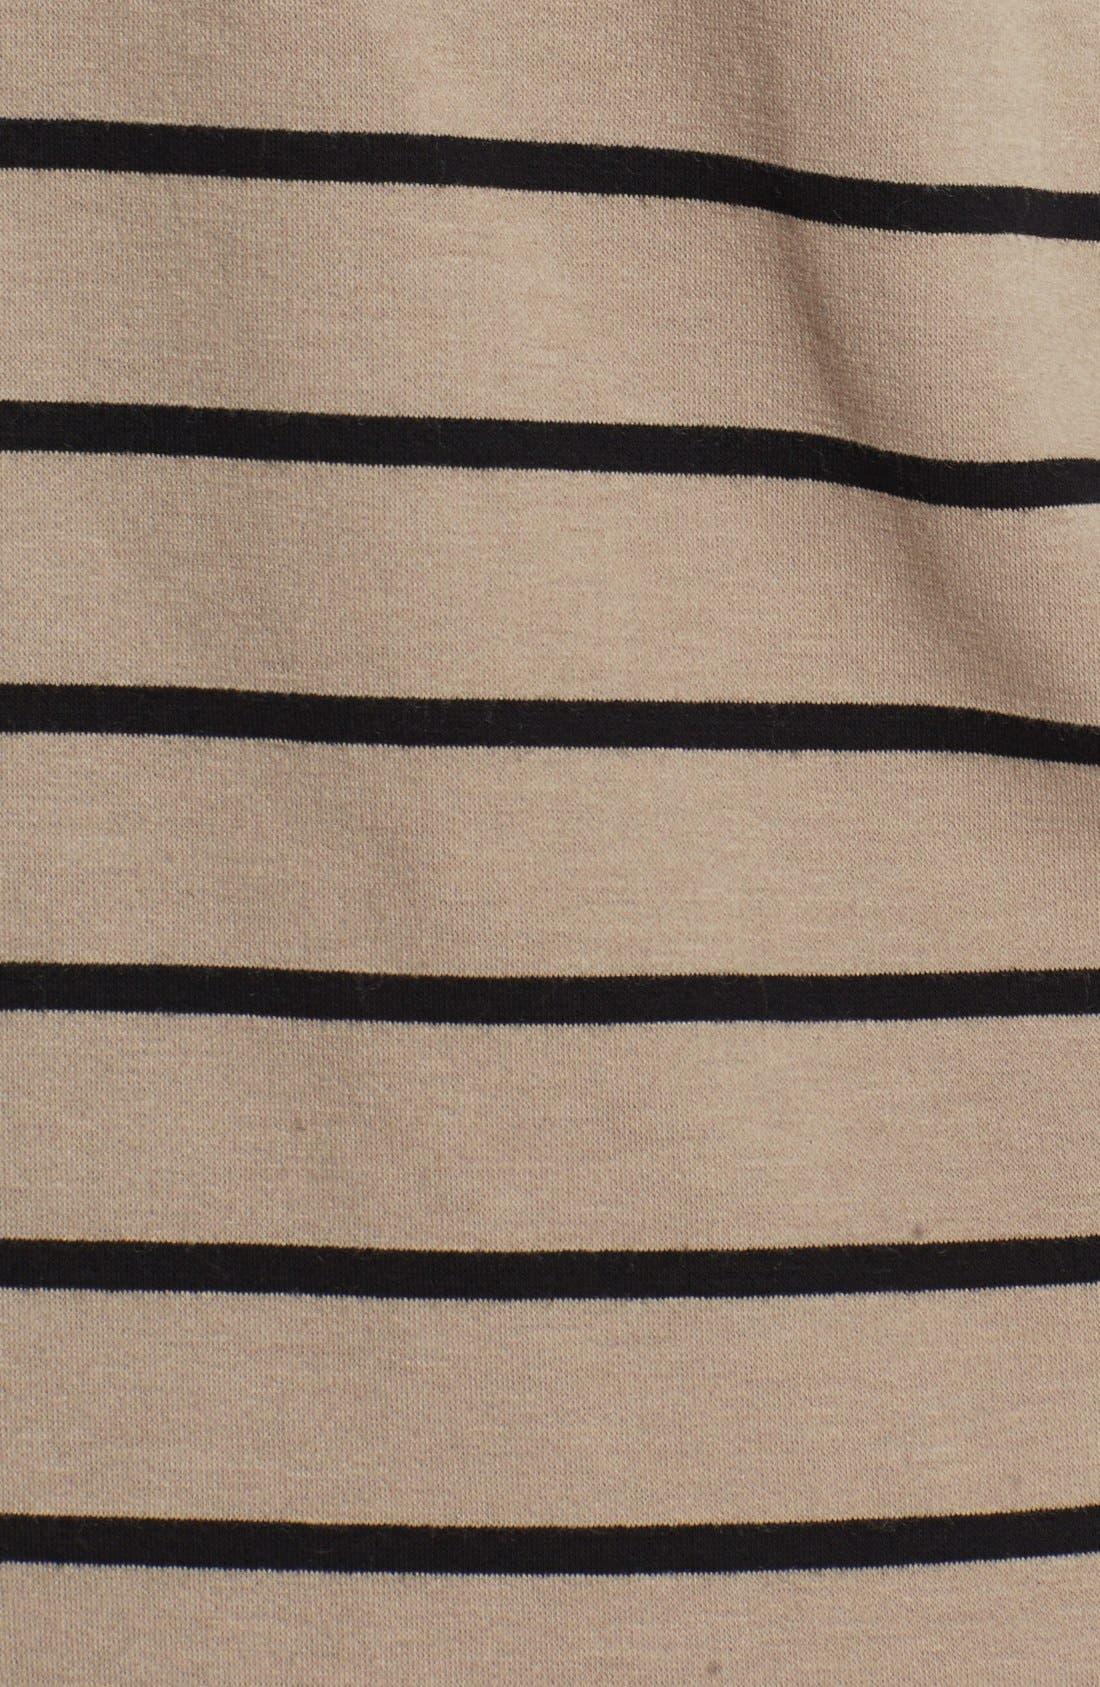 Stripe Fleece Wrap,                             Alternate thumbnail 12, color,